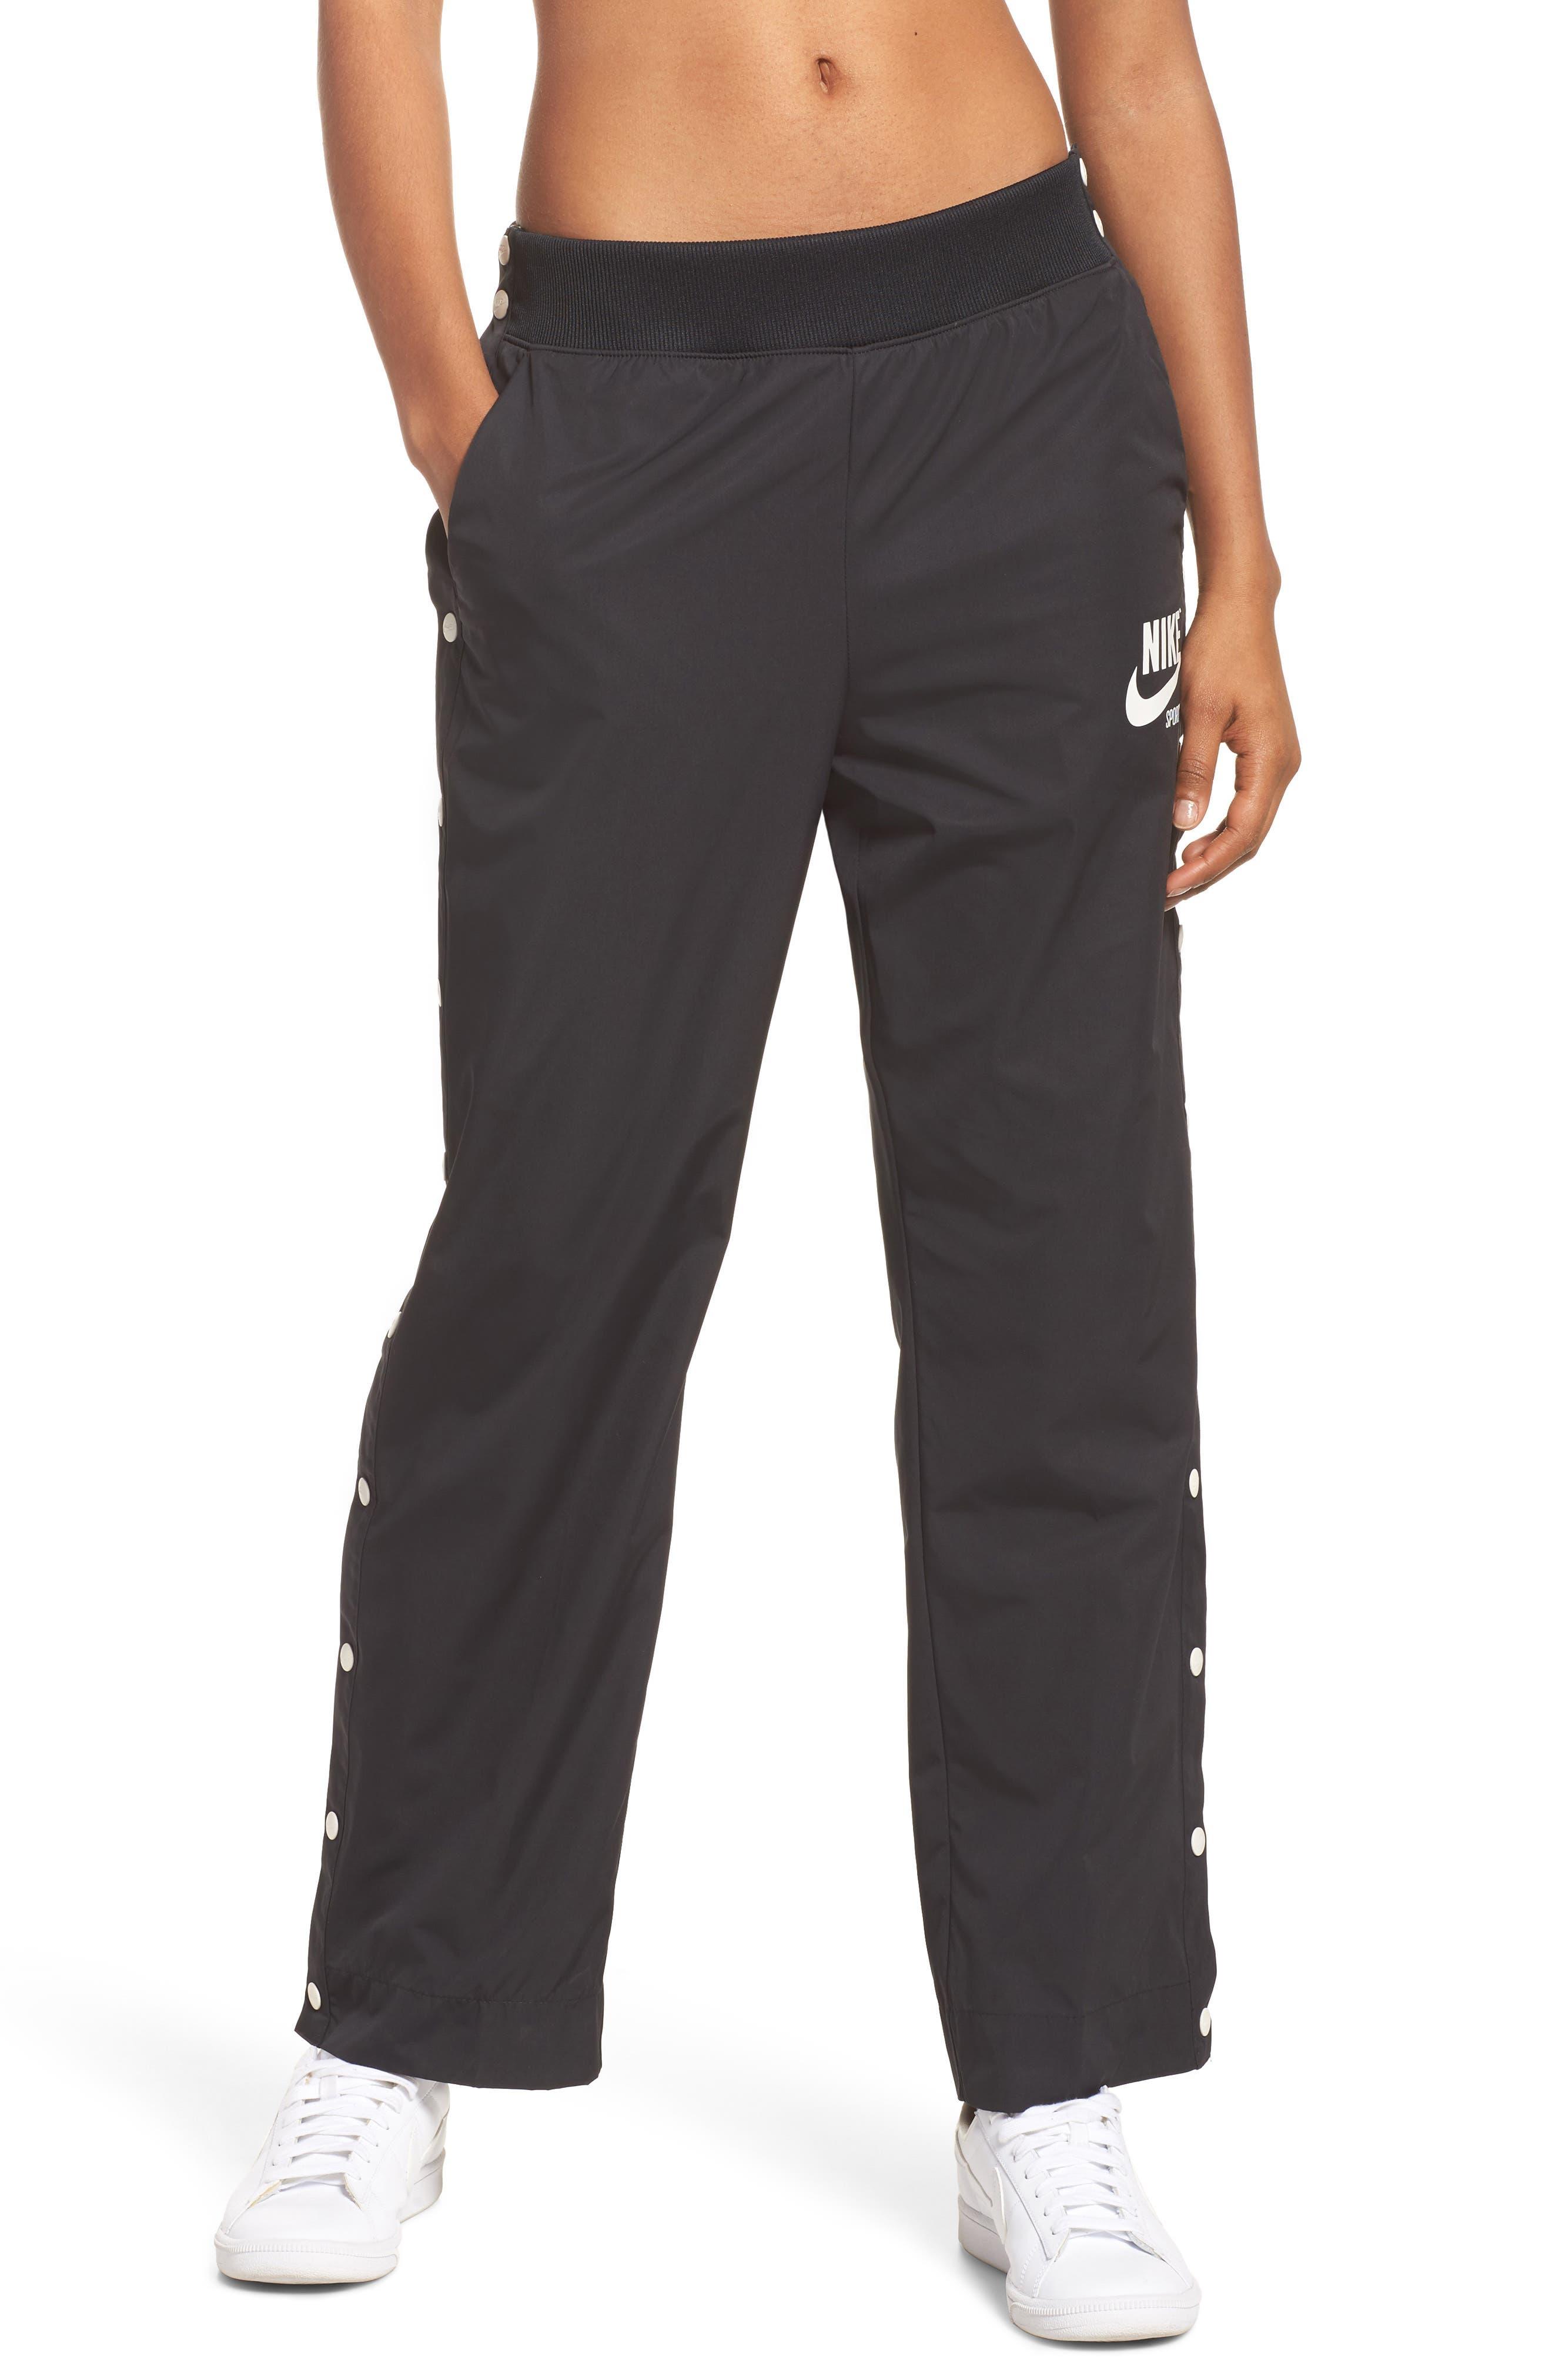 Sportswear Archive Snap Track Pants,                             Main thumbnail 1, color,                             Black/ Sail